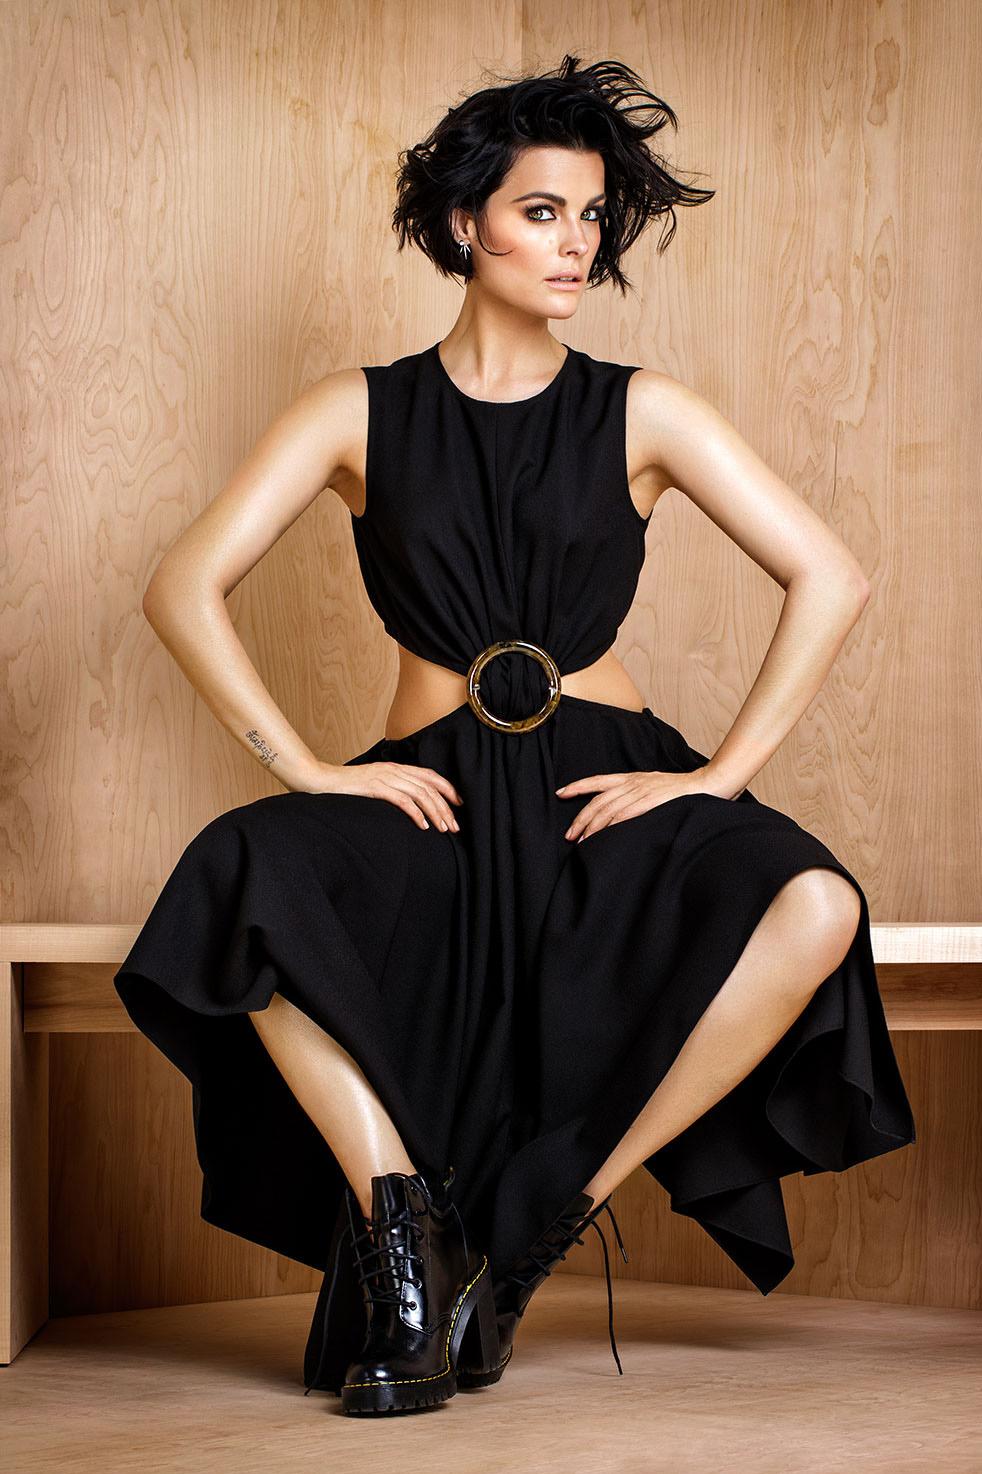 Artis cantik dan model seksi Jaimie Alexander Pose keren Photoshoot